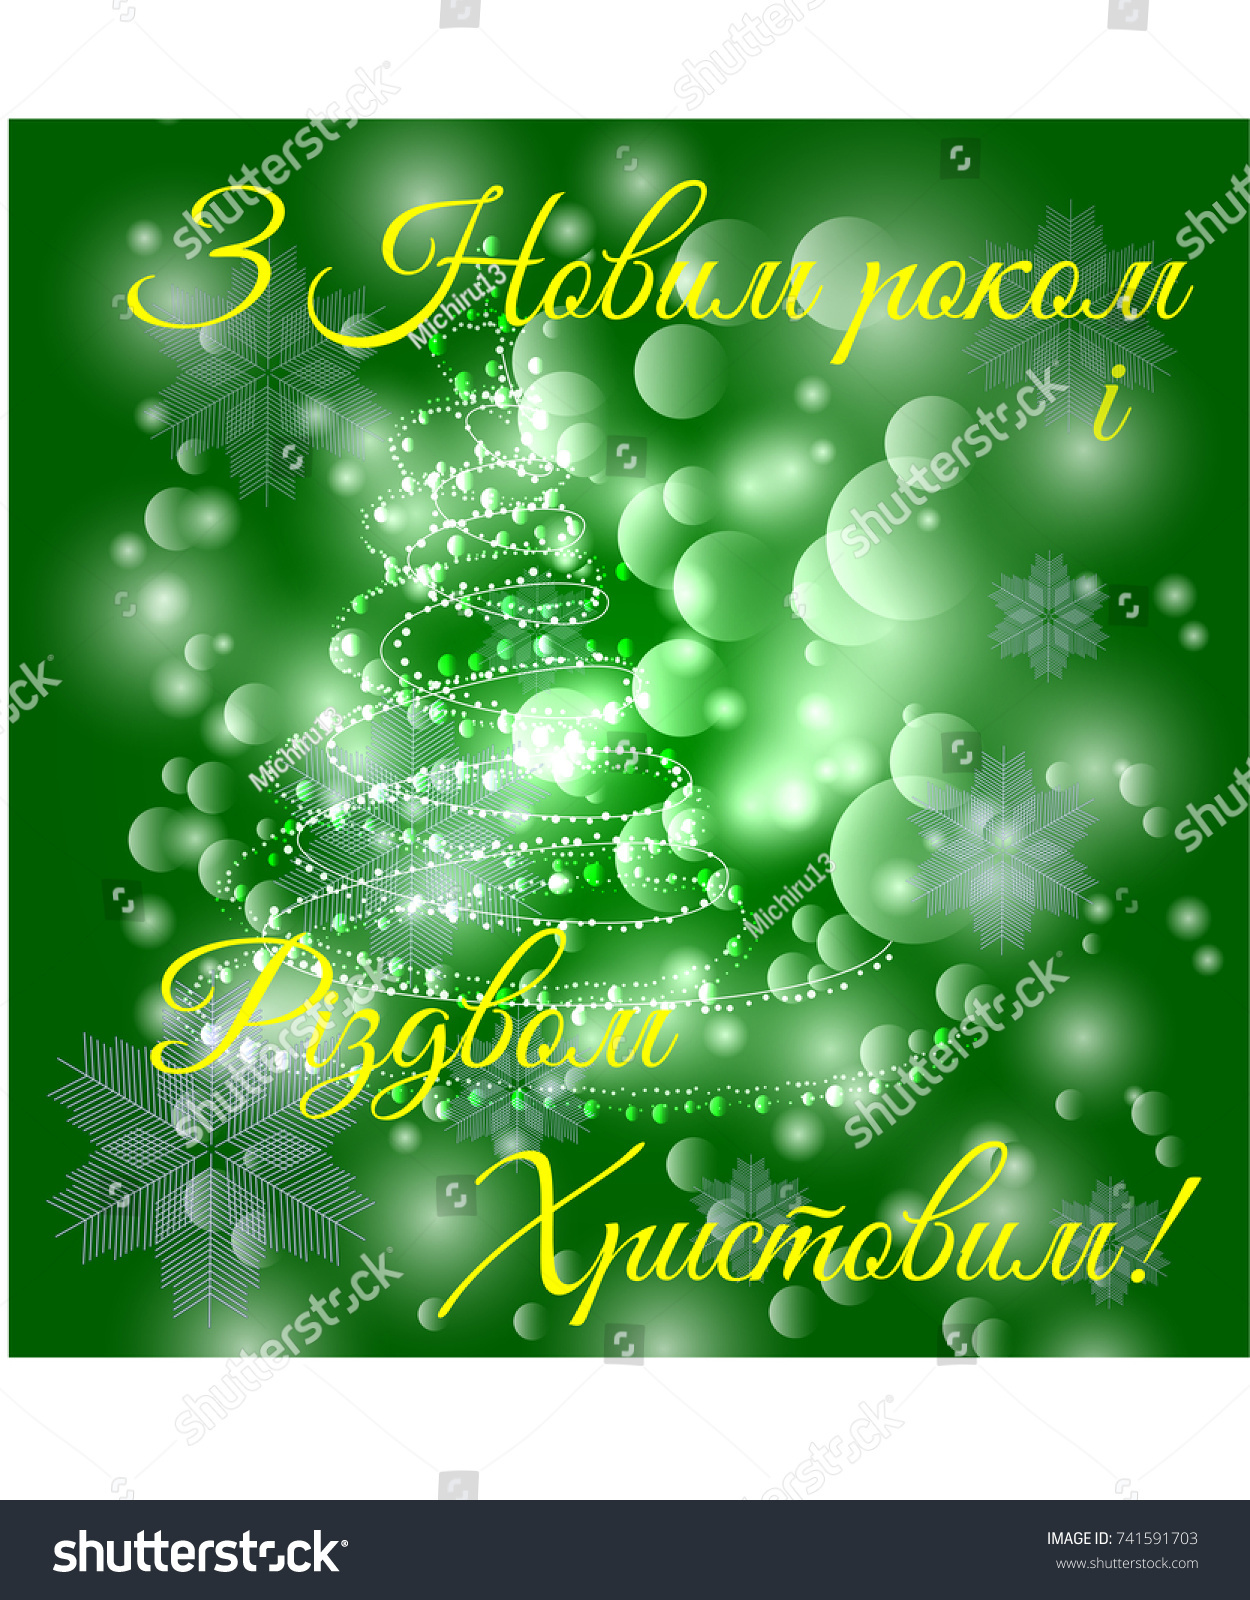 Happy New Year Merry Christmas Ukrainian Stock Vector Royalty Free